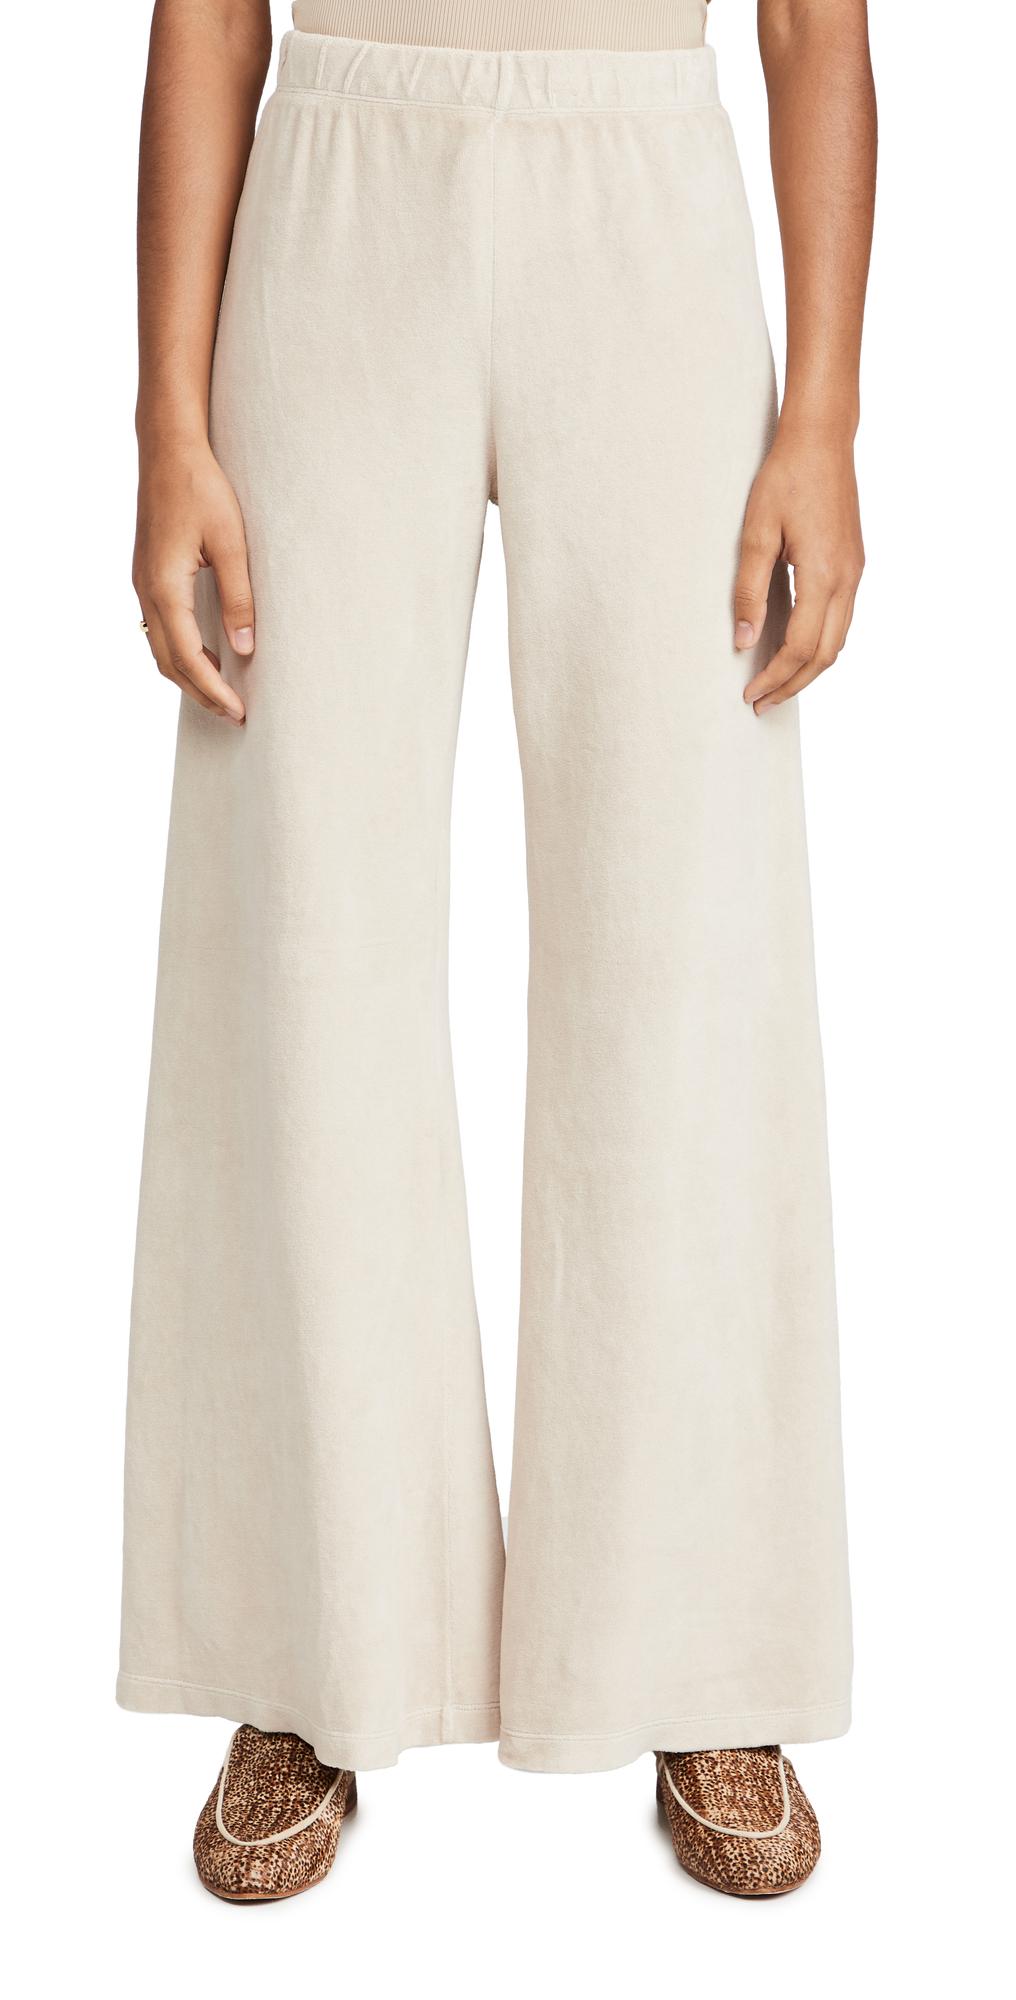 Velour Wide Leg Pants